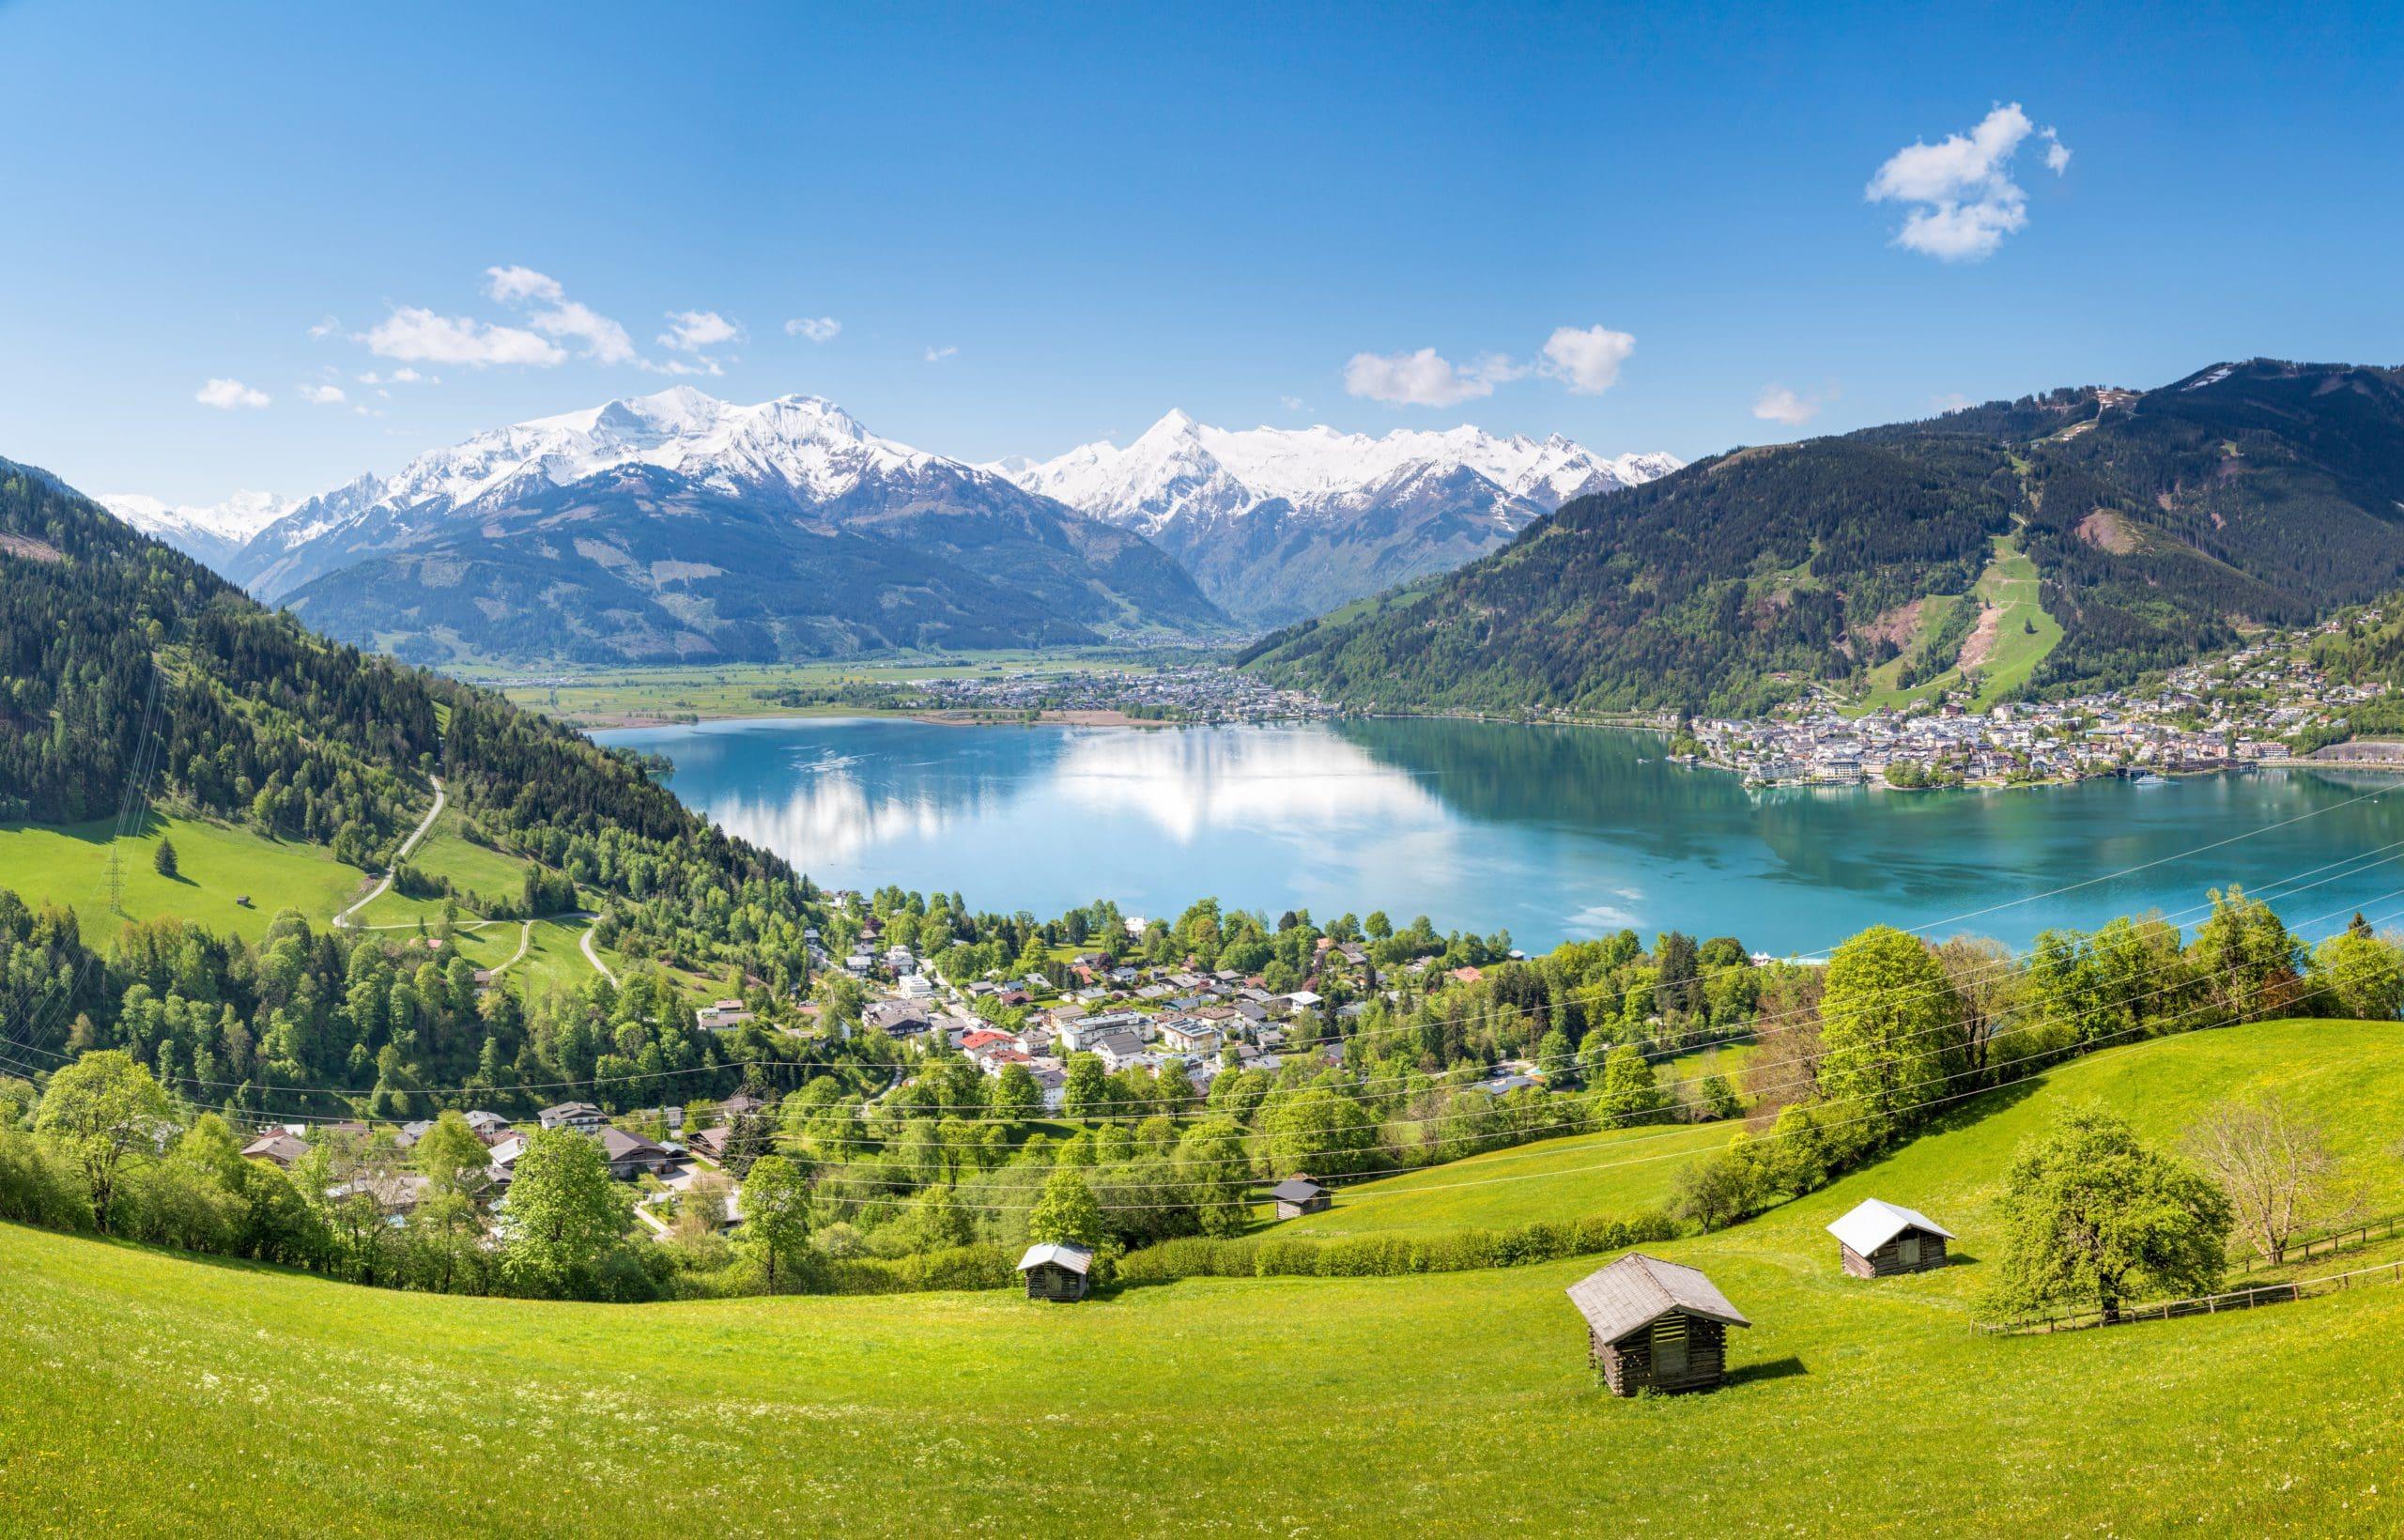 Zell am See Immobilie in schöner Landschaft